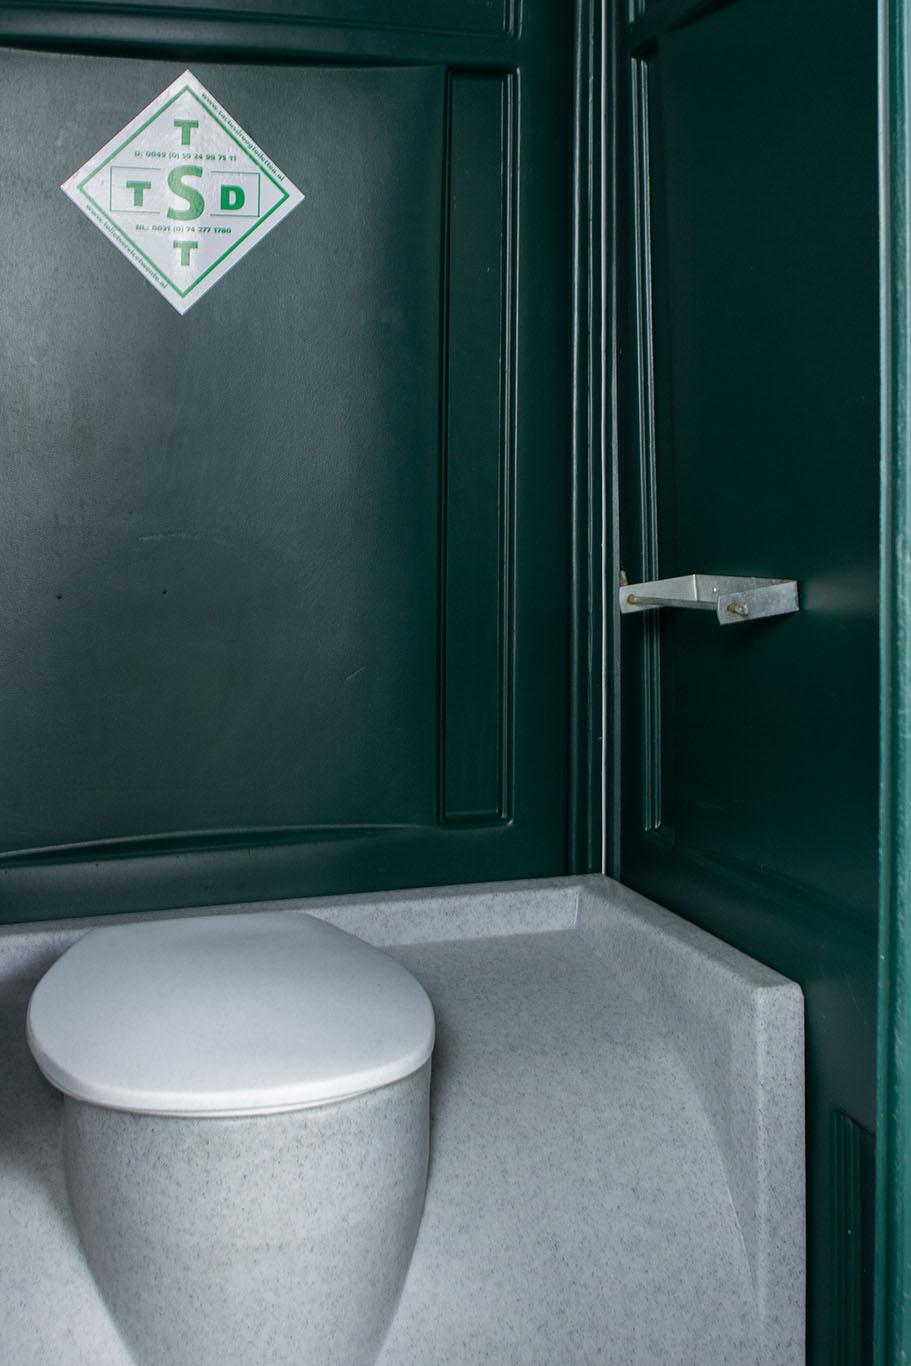 Mobiele toiletcabine binnenkant toiletpapier houder